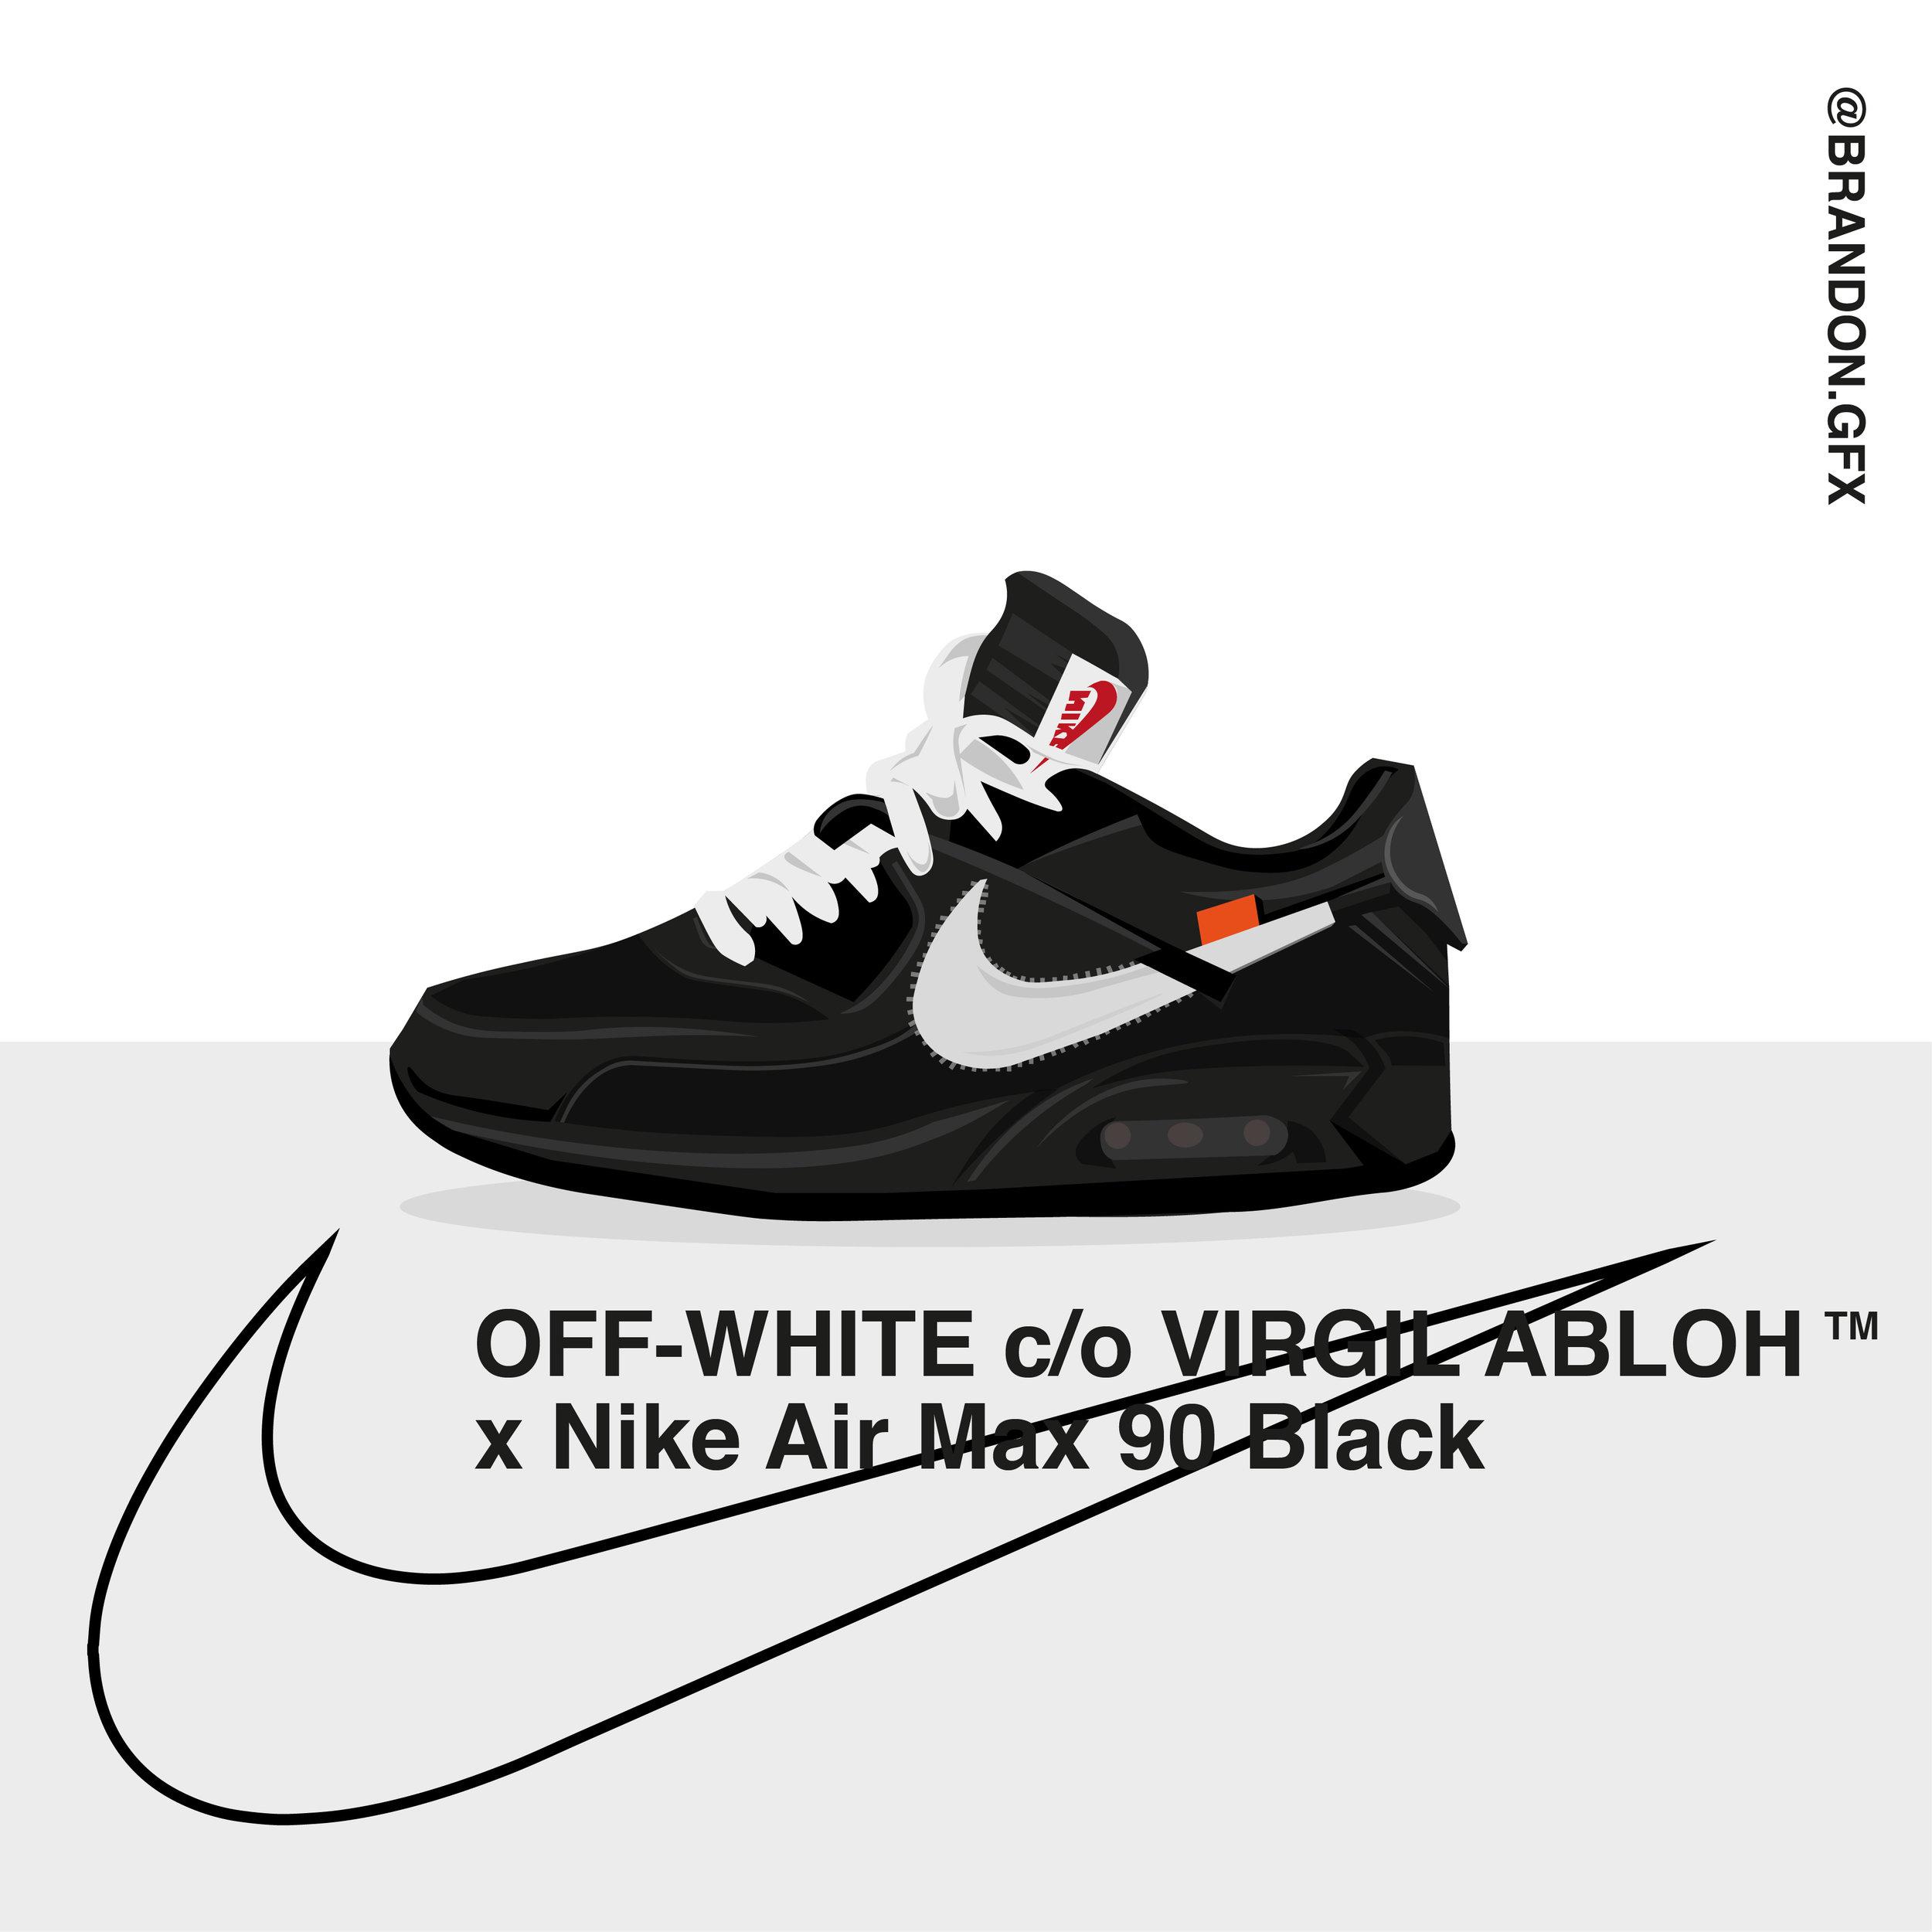 OFF-WHITE-AIRMAX-01.jpg